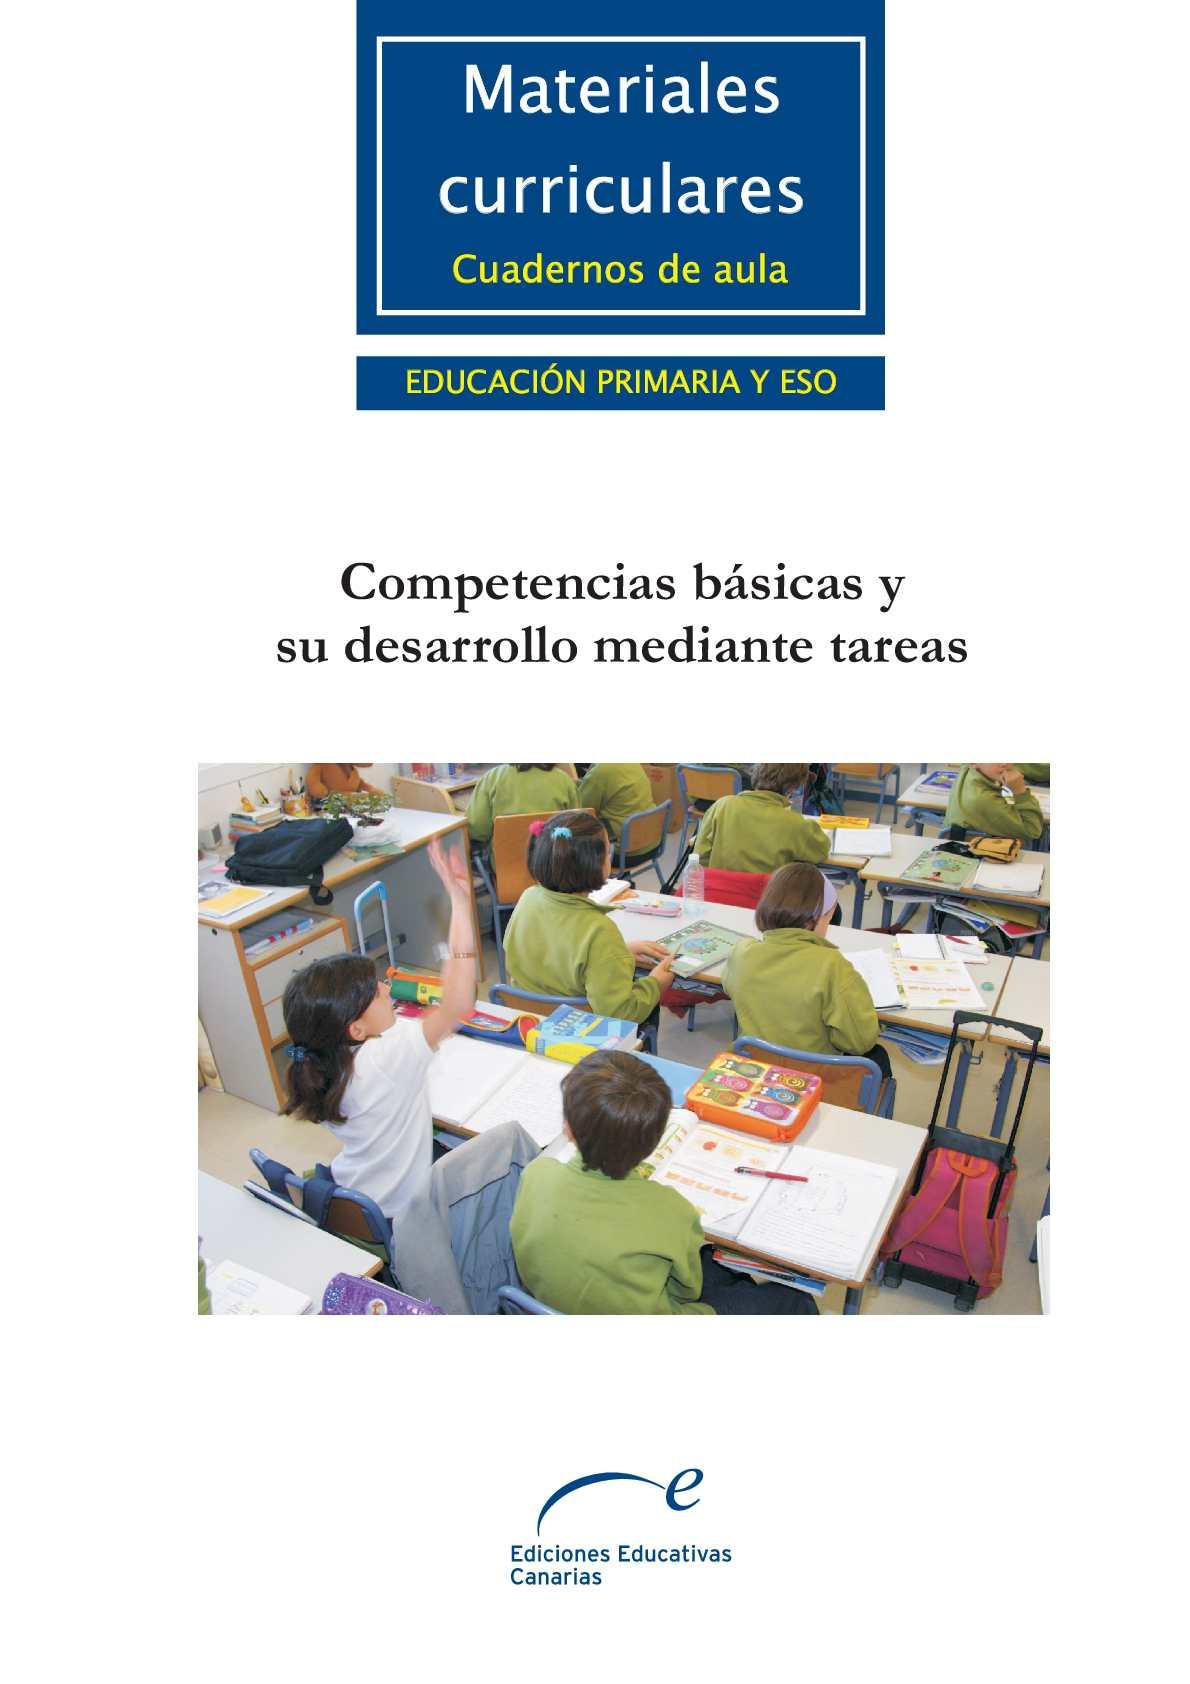 Calaméo - Comp_basicas